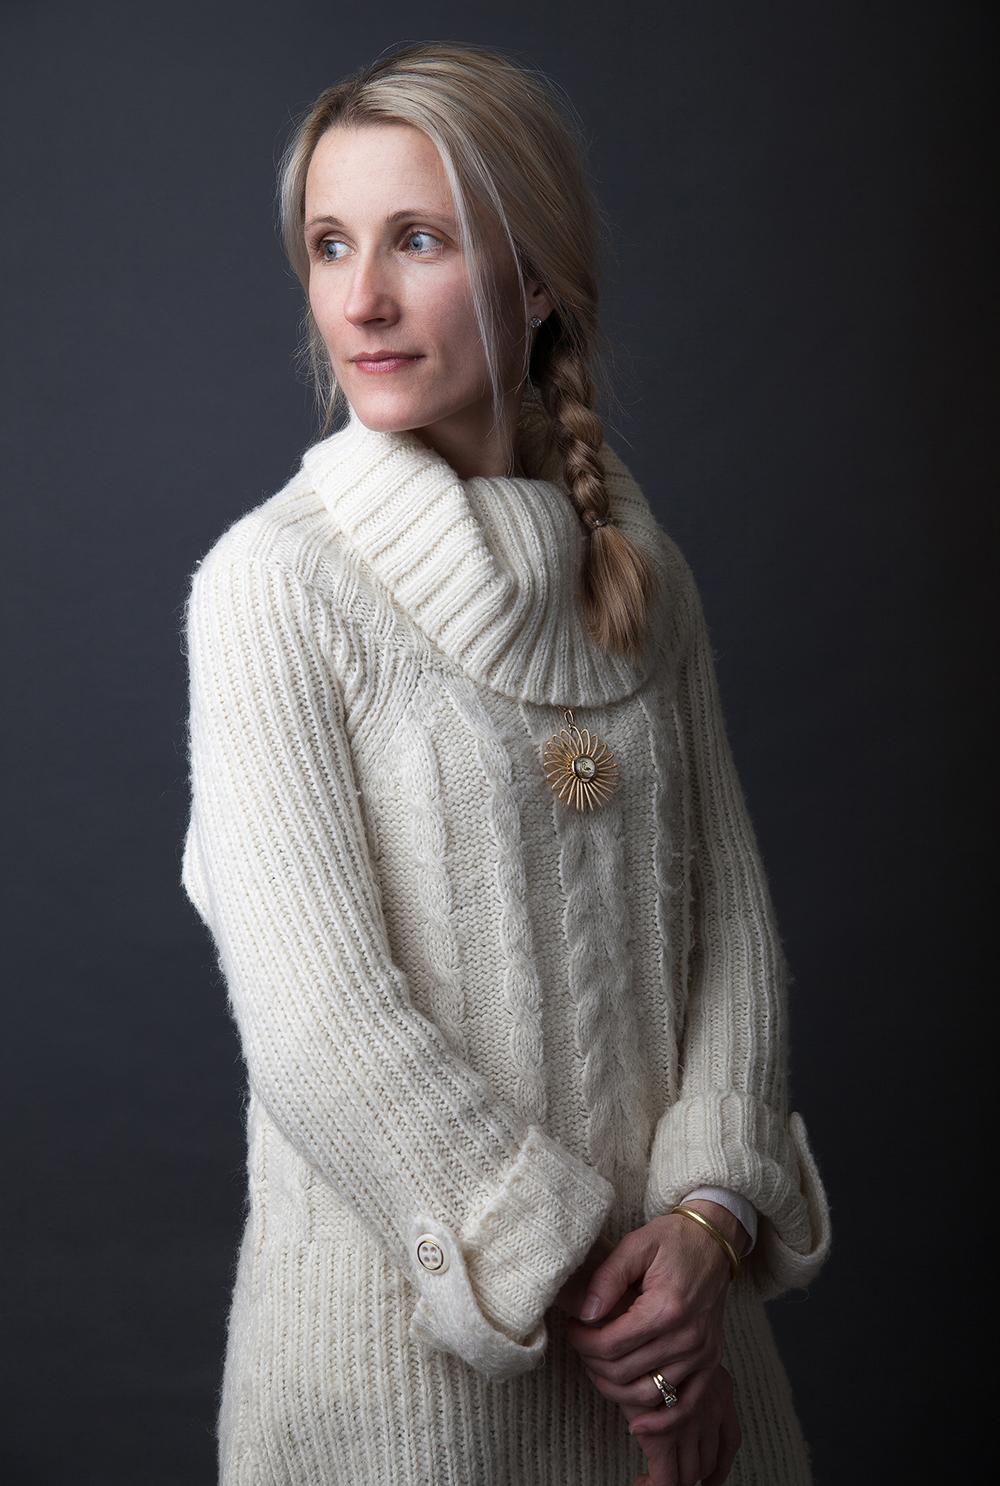 Erin Flett - Maine magazine